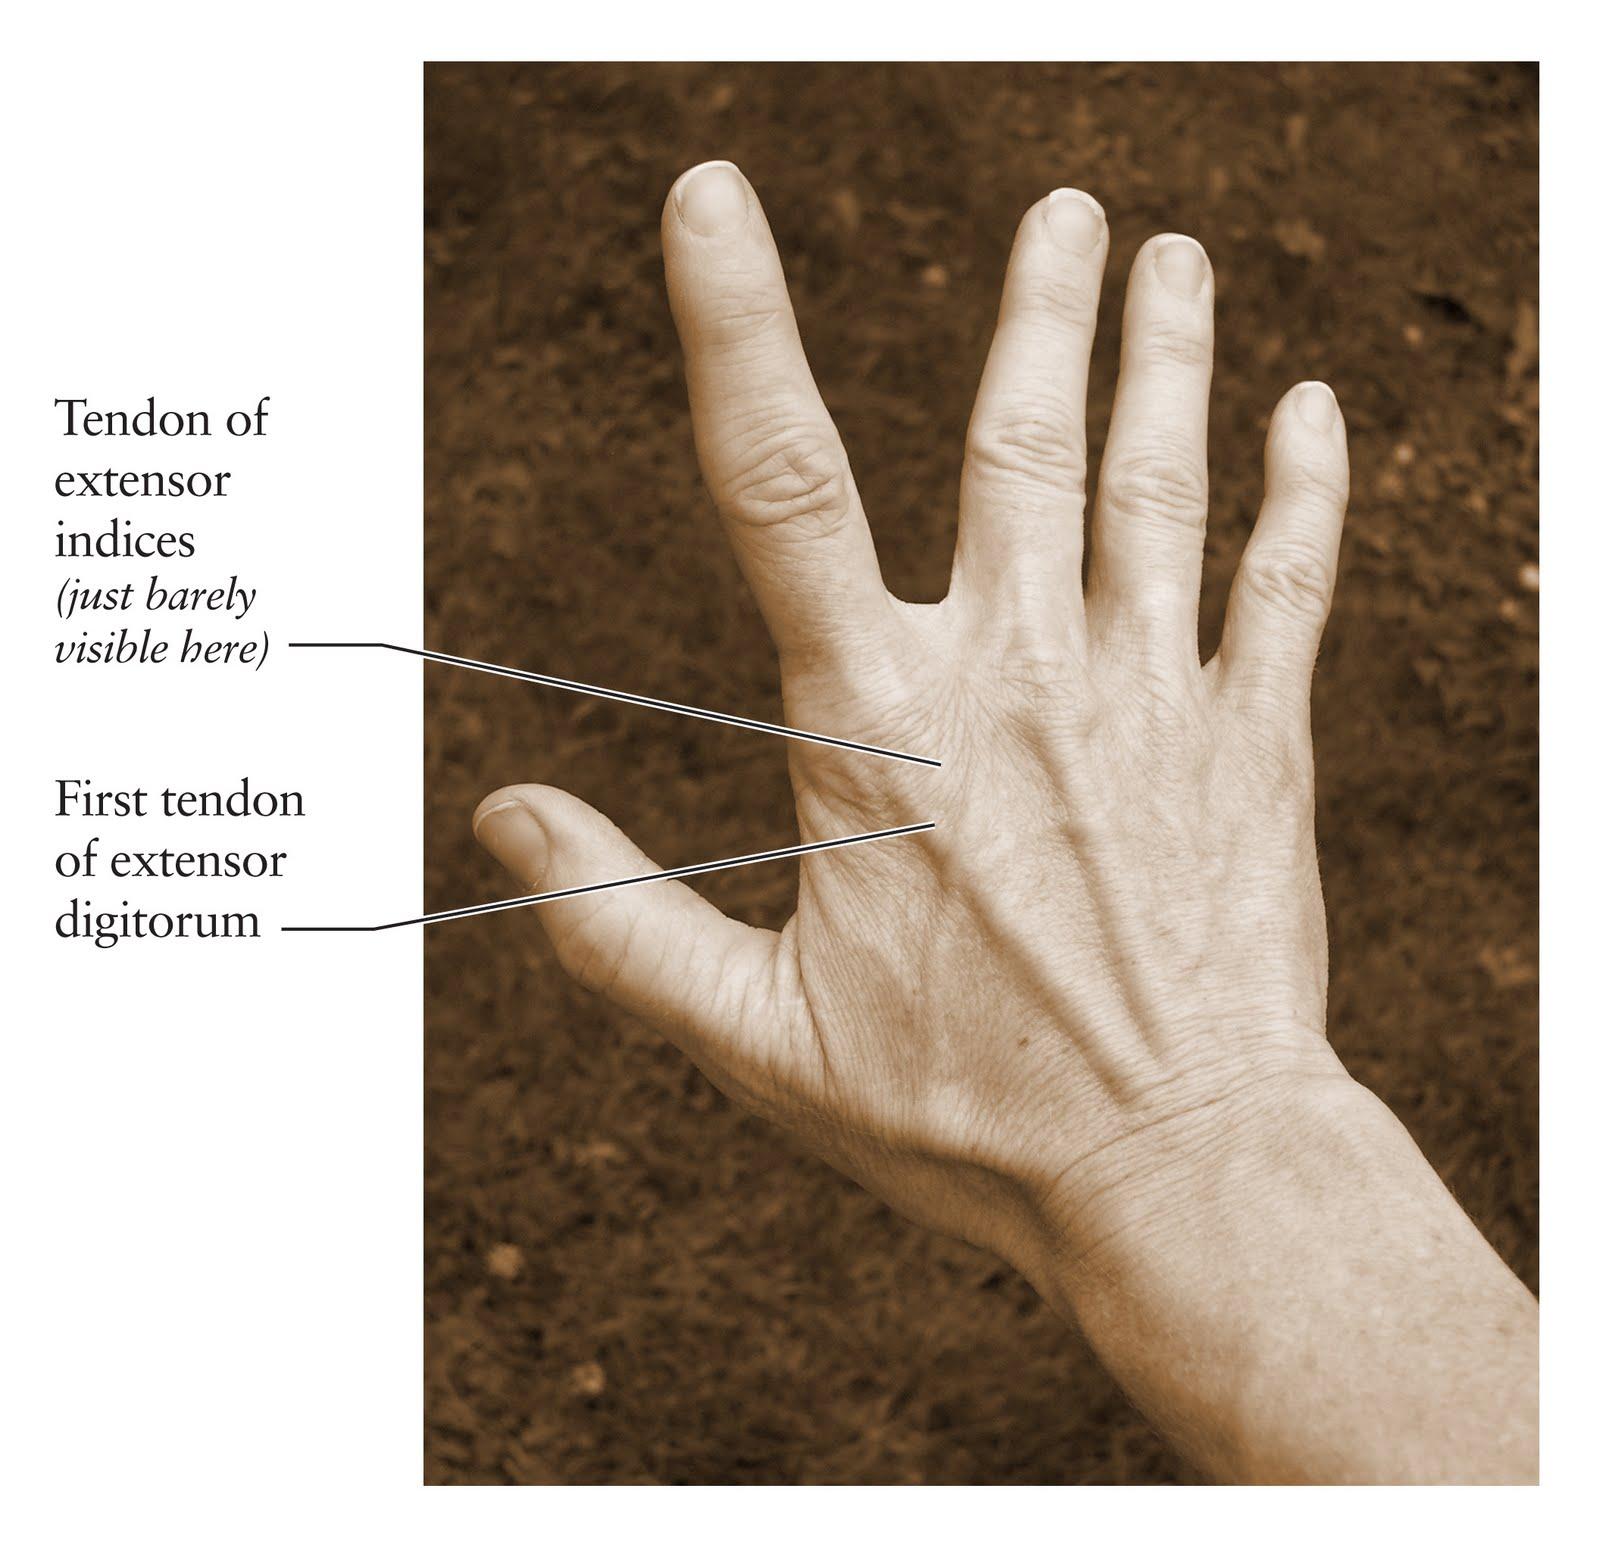 human anatomy for the artist the dorsal hand the dorsal